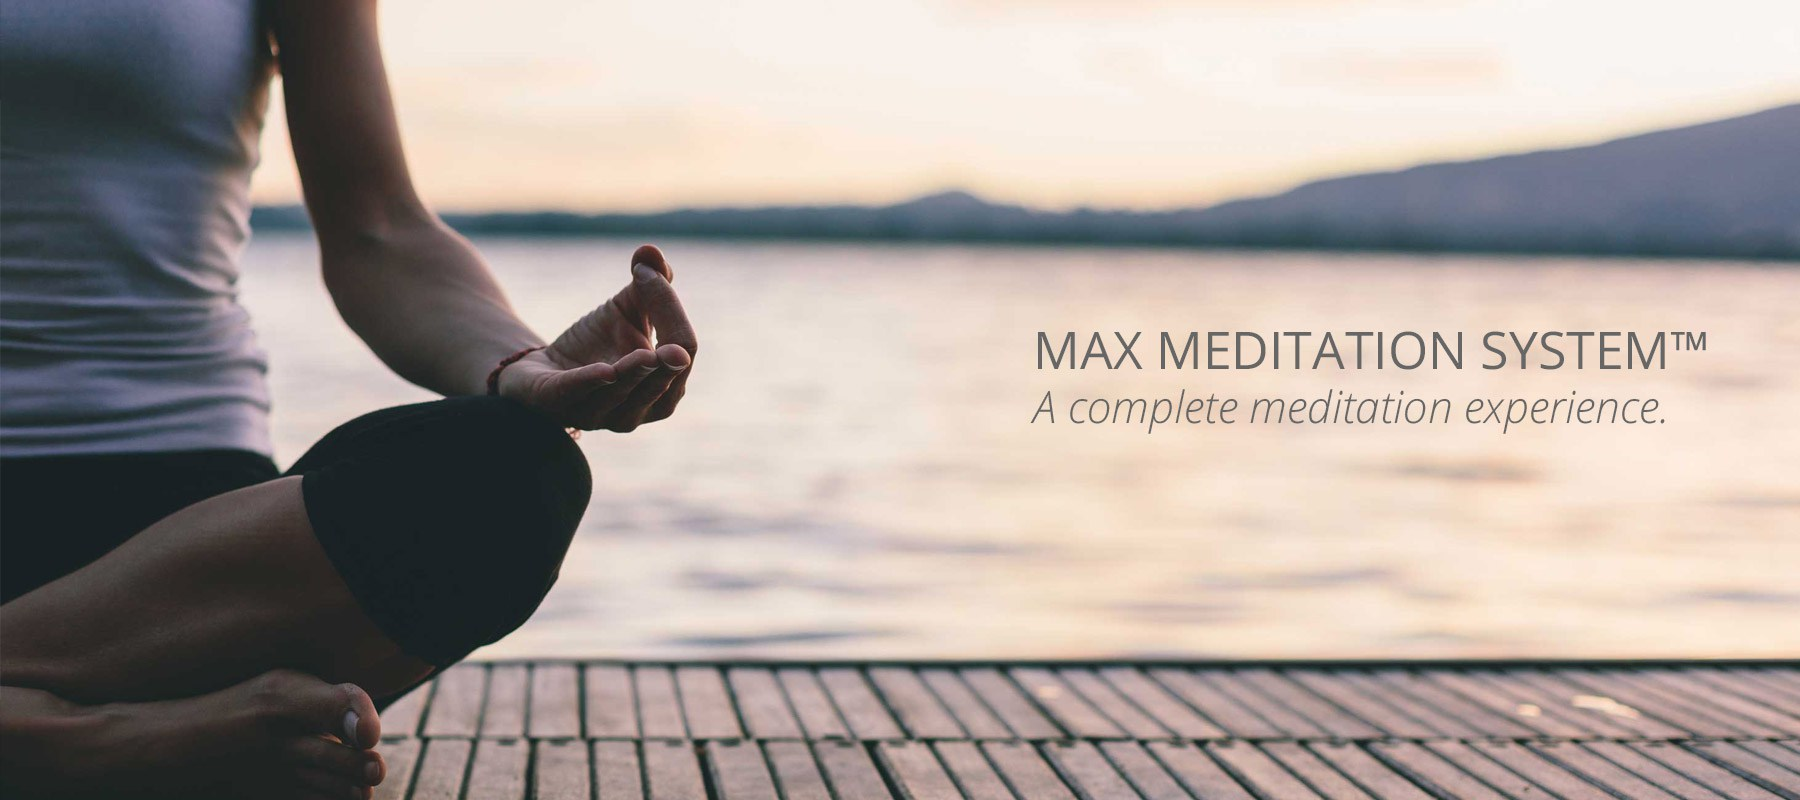 maxmeditationsystem-1